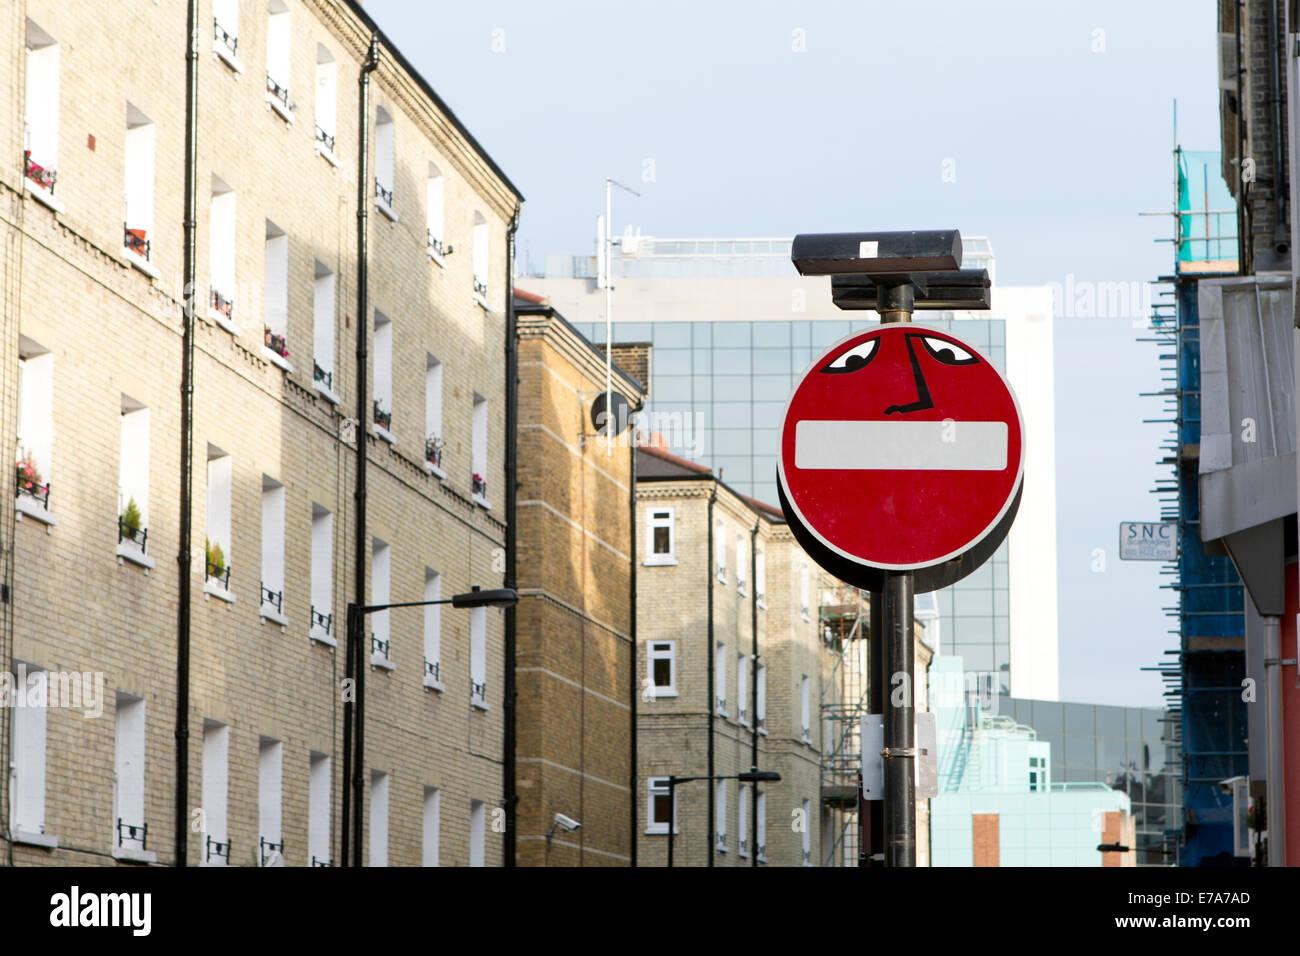 Graffiti on a No Entry street sign, John Fisher Street, London, England, UK. - Stock Image